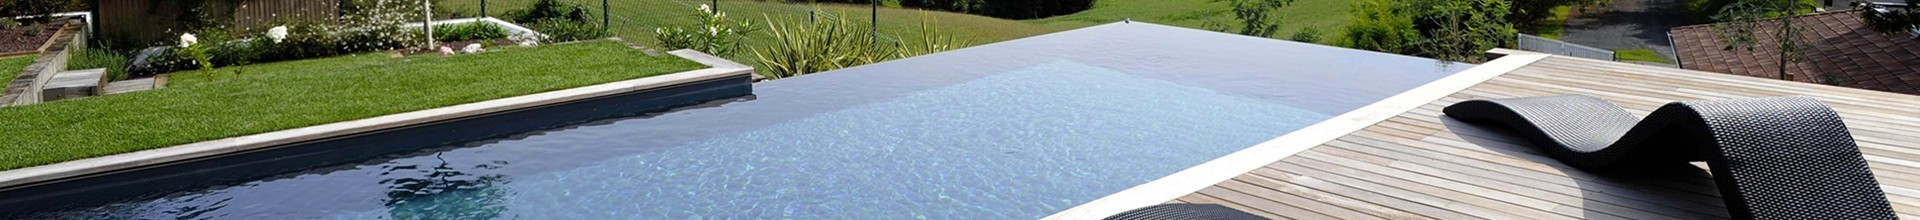 Direct usine, piscine coque prix Haute-Marne